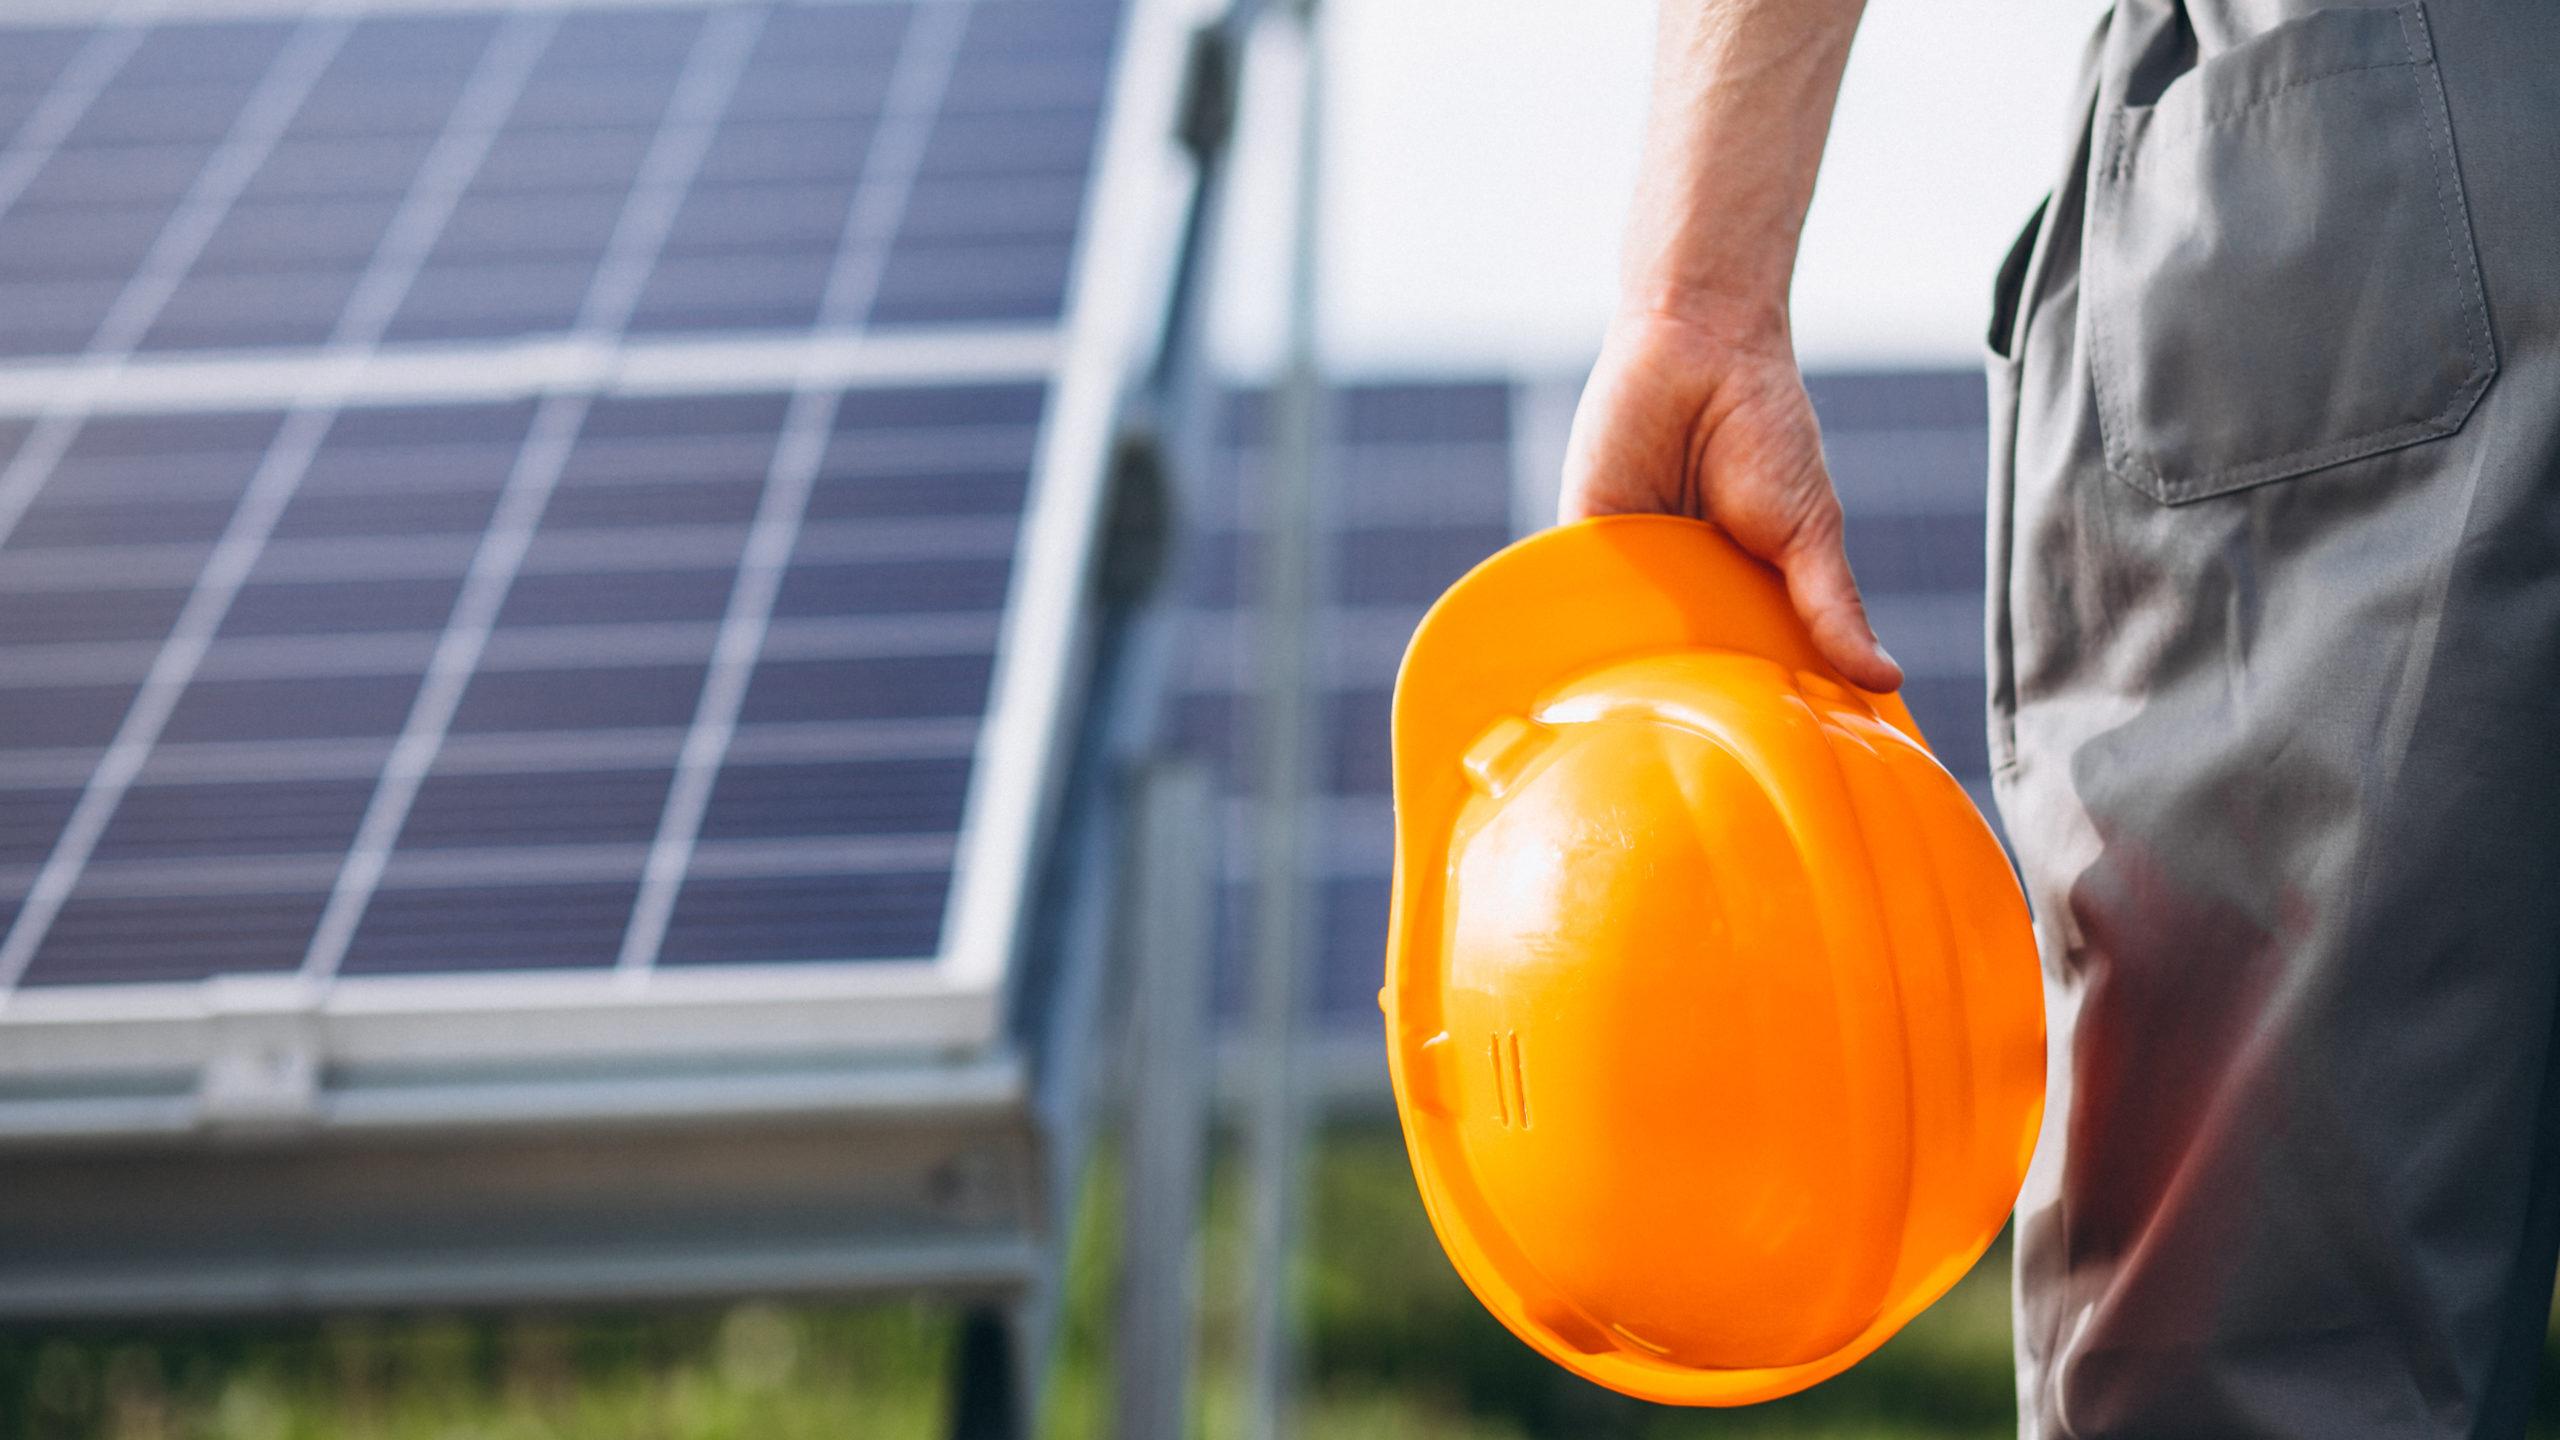 ENERGIA SOLAR: ECONOMIA DE SOBRA